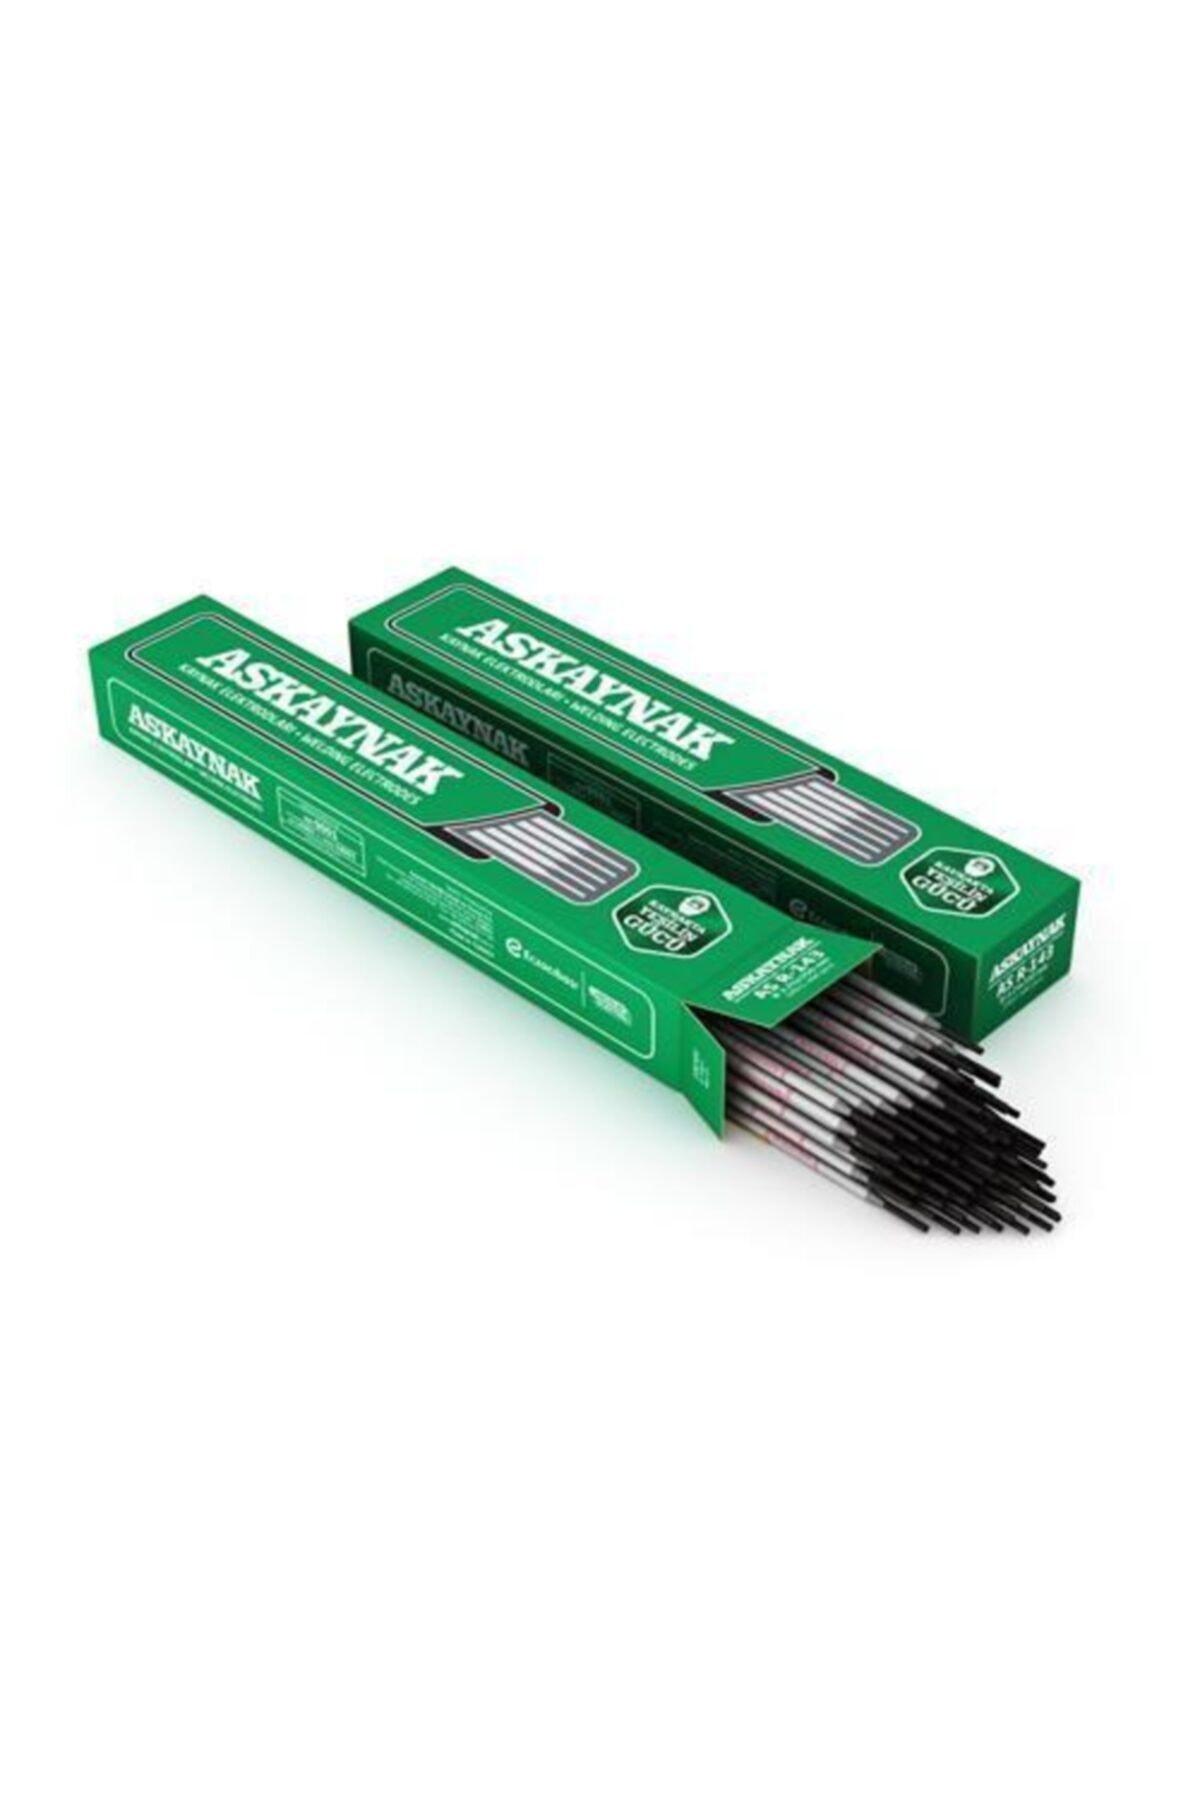 Askaynak As R-143 Rutil Kaynak Elektrodu 3.25x350 100 Adet 1